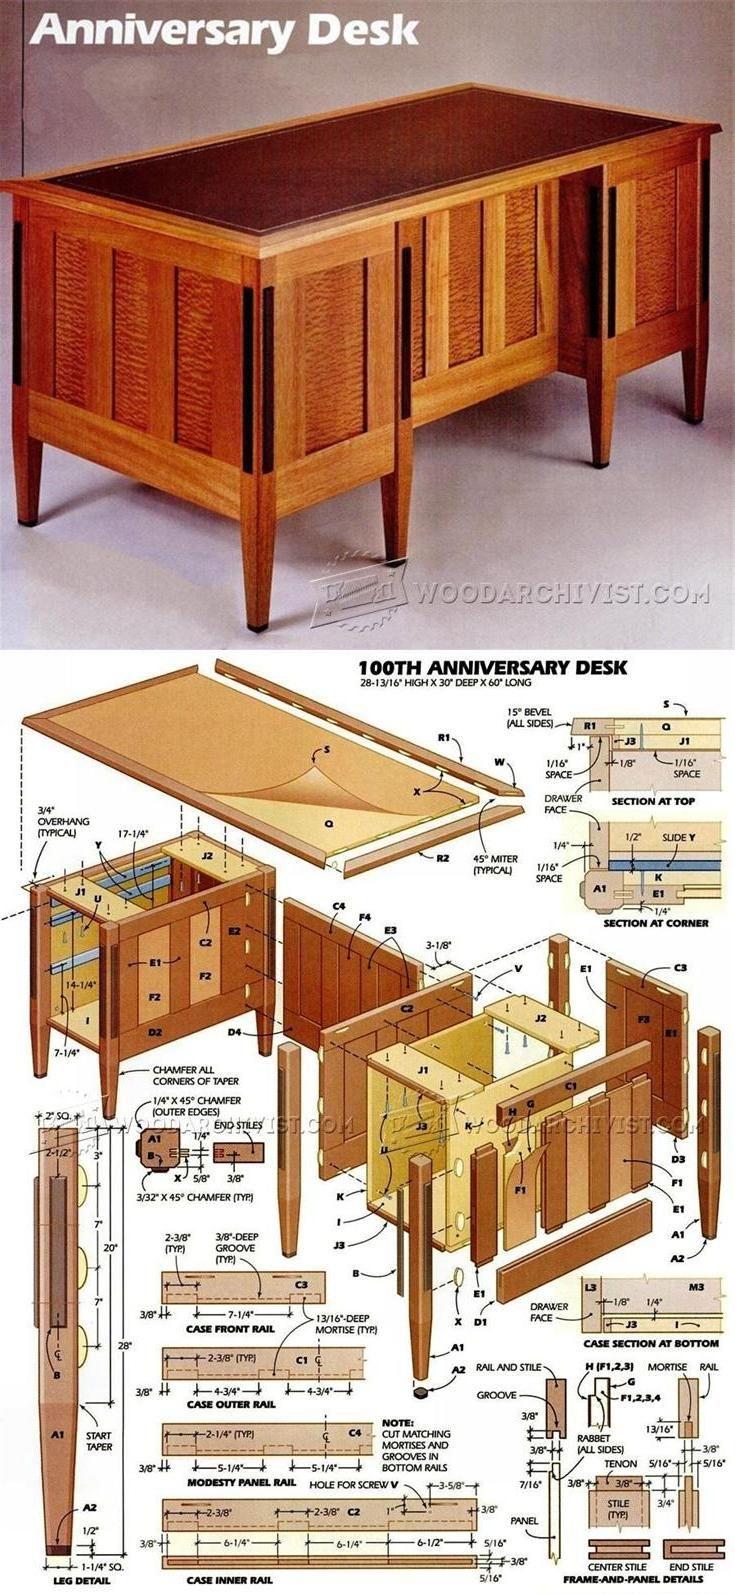 Anniversary Desk Plans - Furniture Plans and Projects | WoodArchivist.com